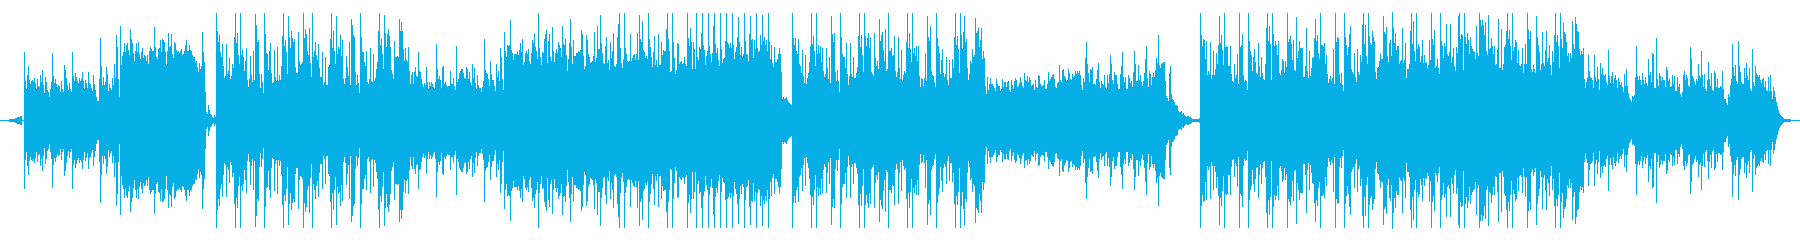 K-POP/BTS/ギター/エモい感動的の再生済みの波形